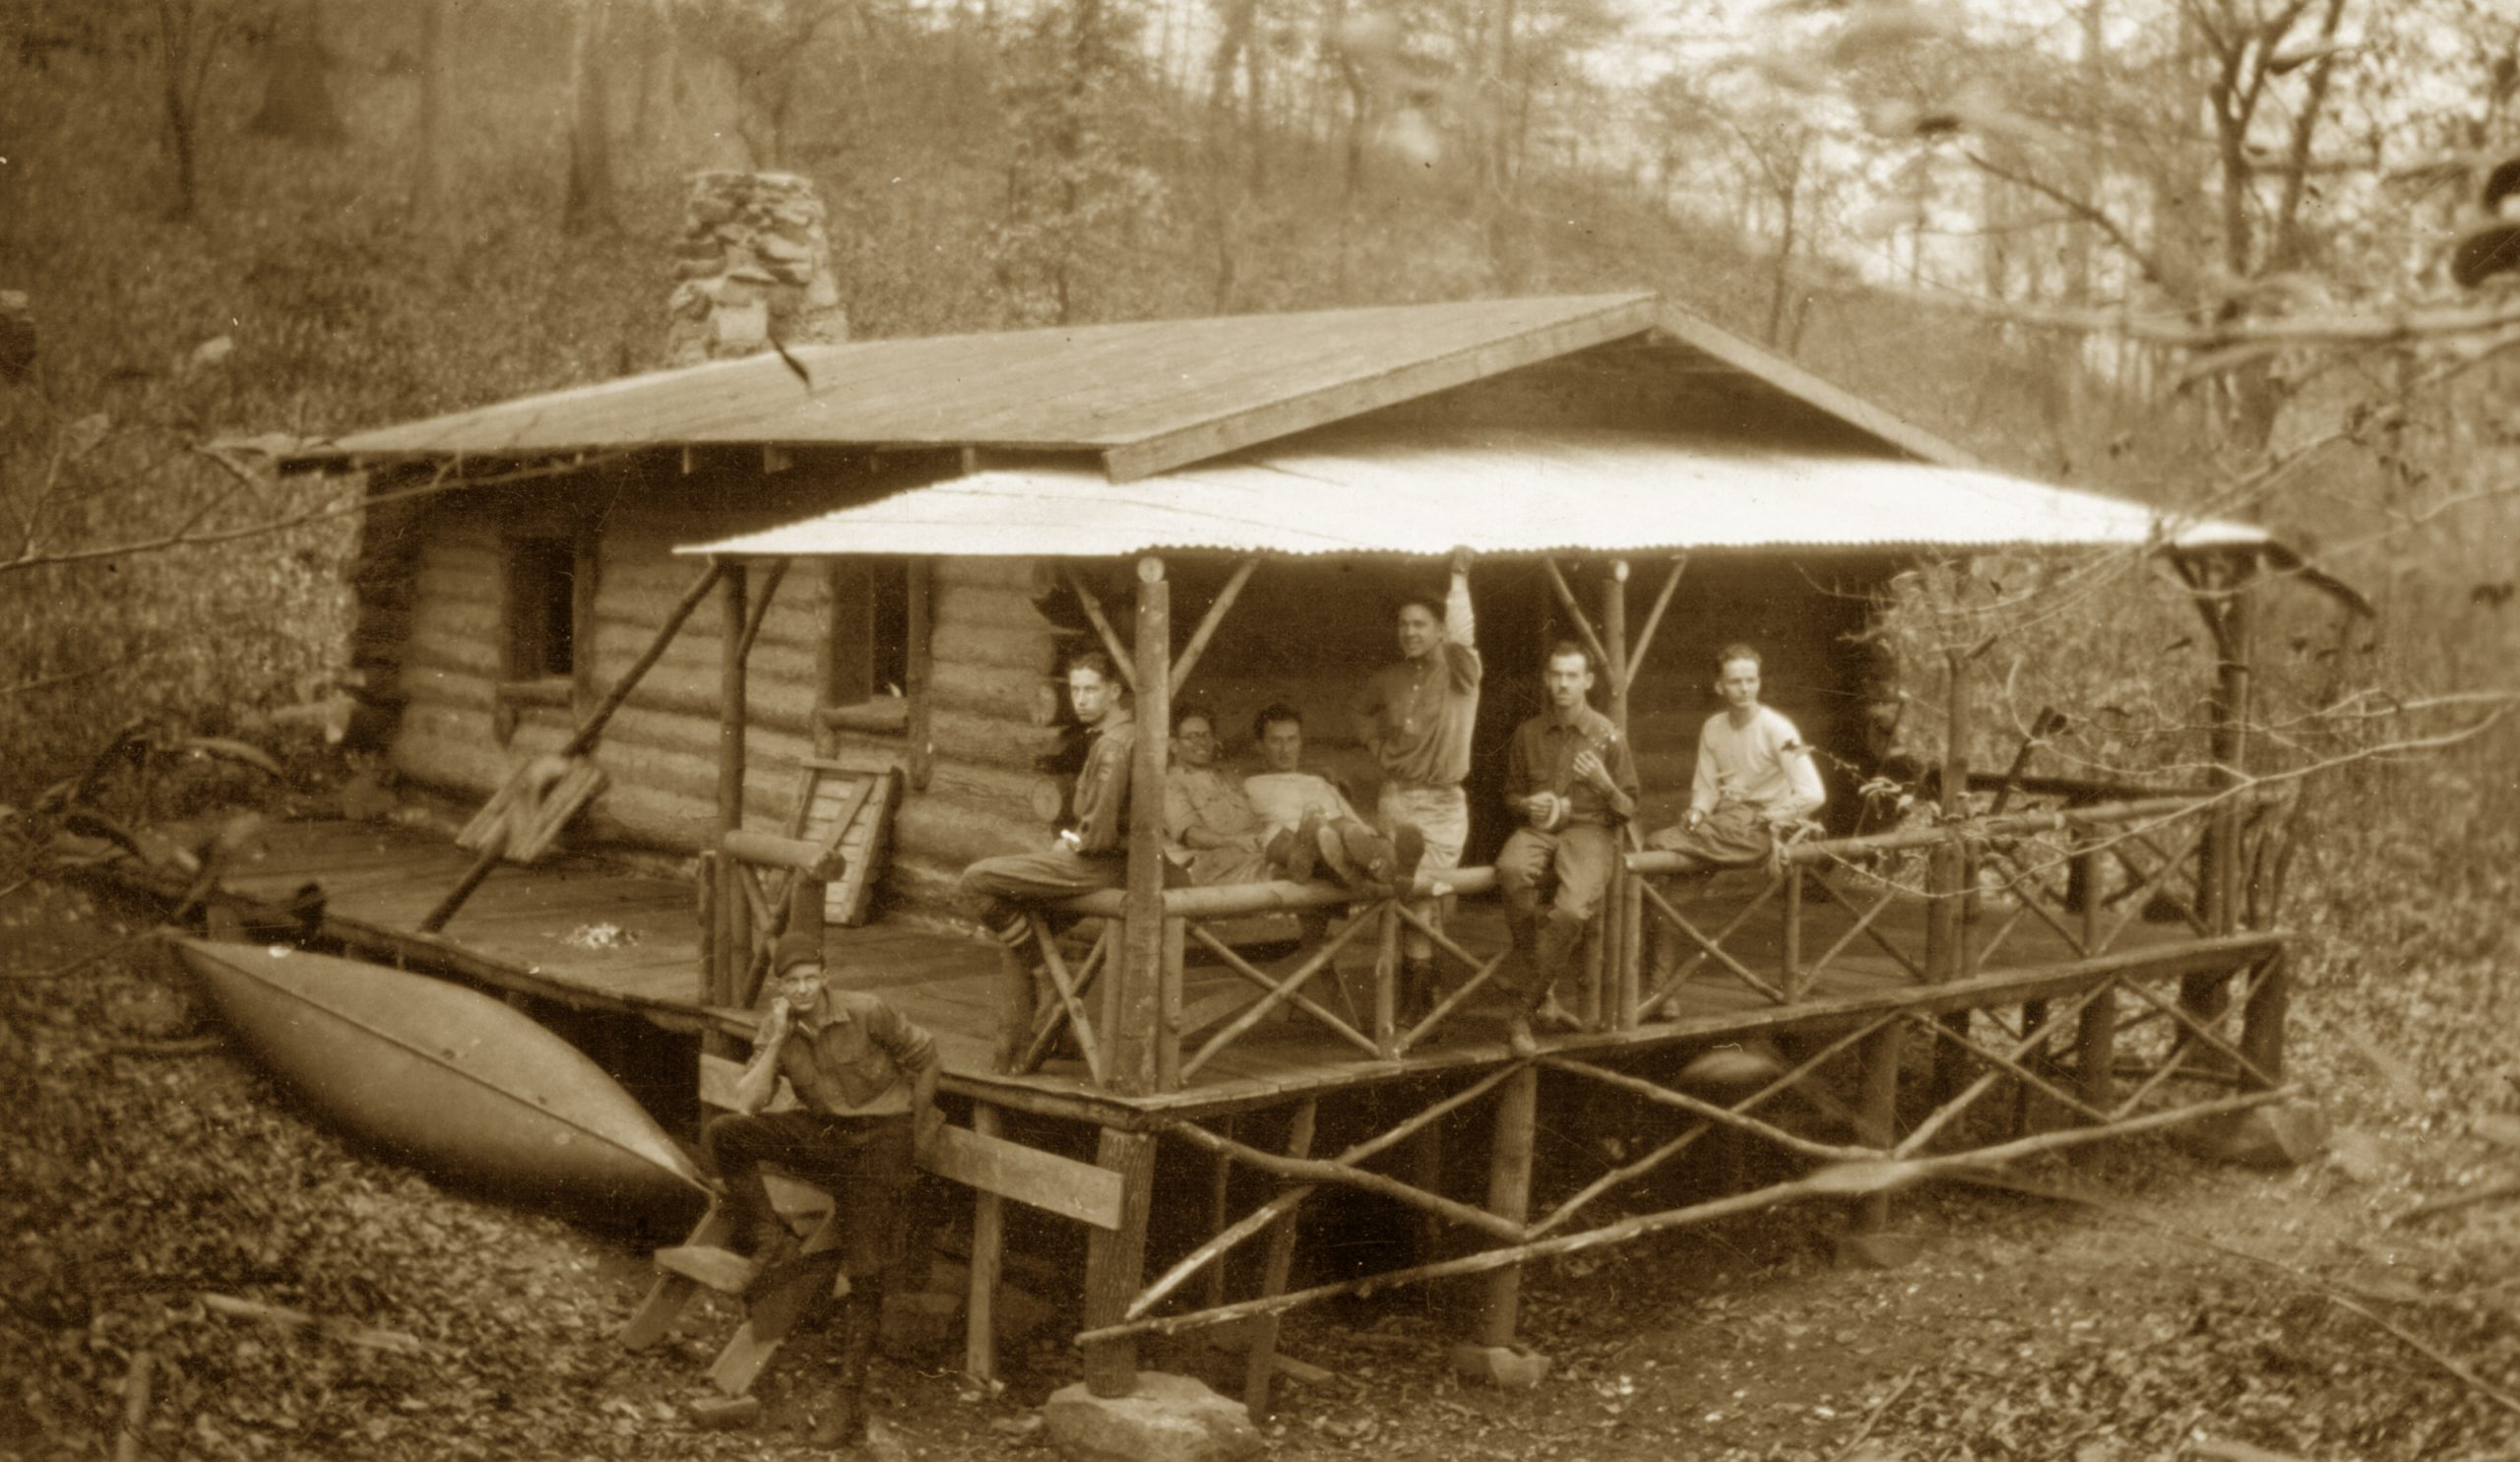 Troop 5 Cabin in 1922